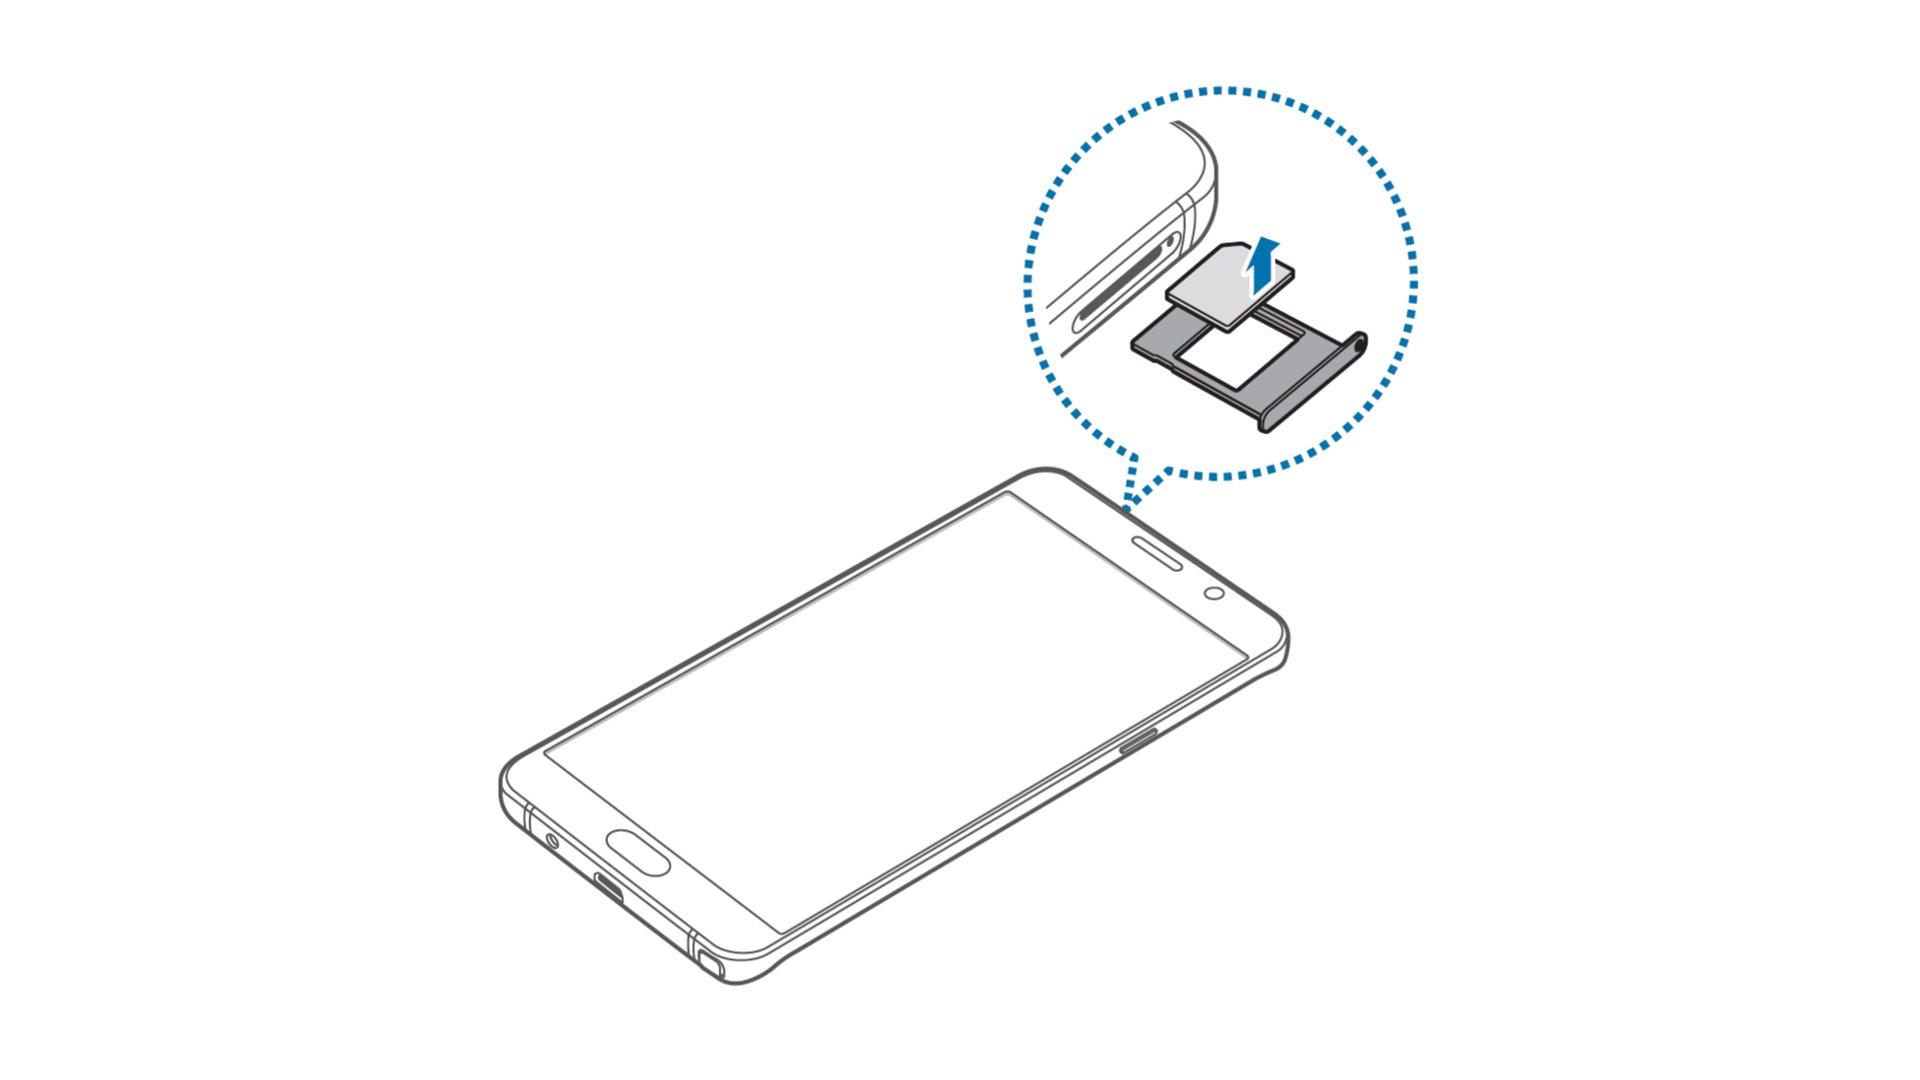 Samsung Galaxy Note 5 - Remove SIM Card In Single SIM Model